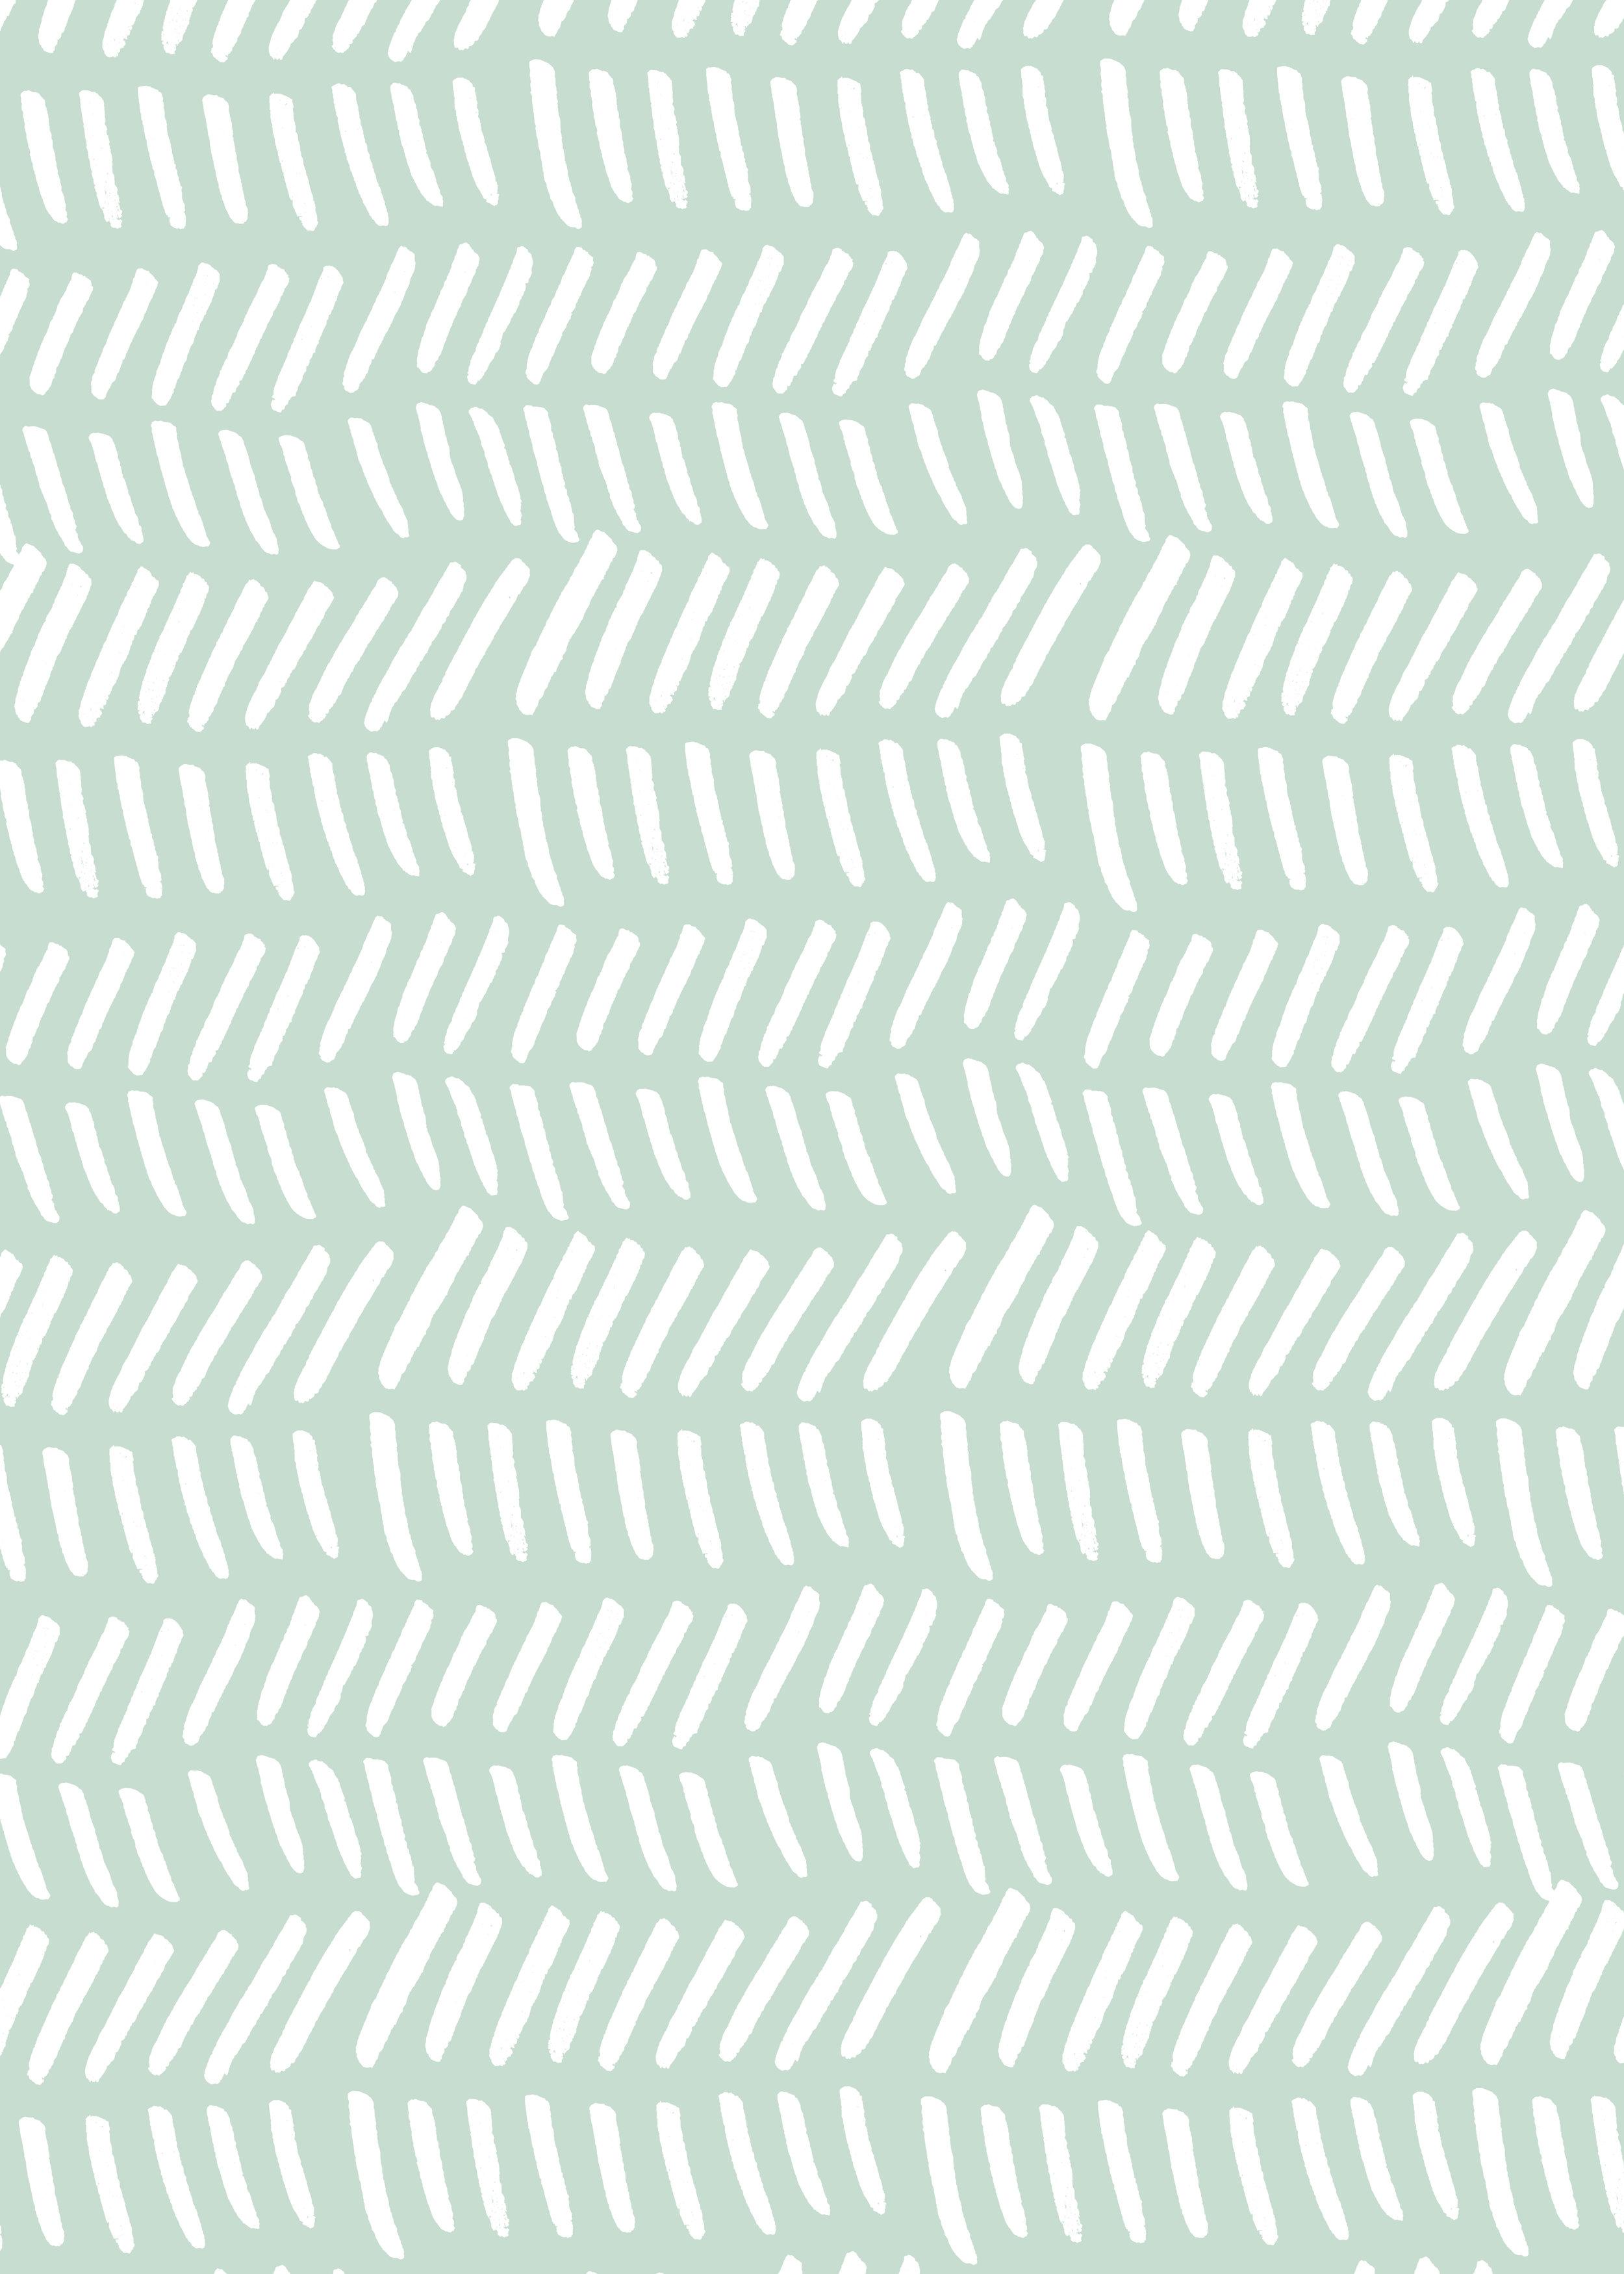 Little Lines green.jpg